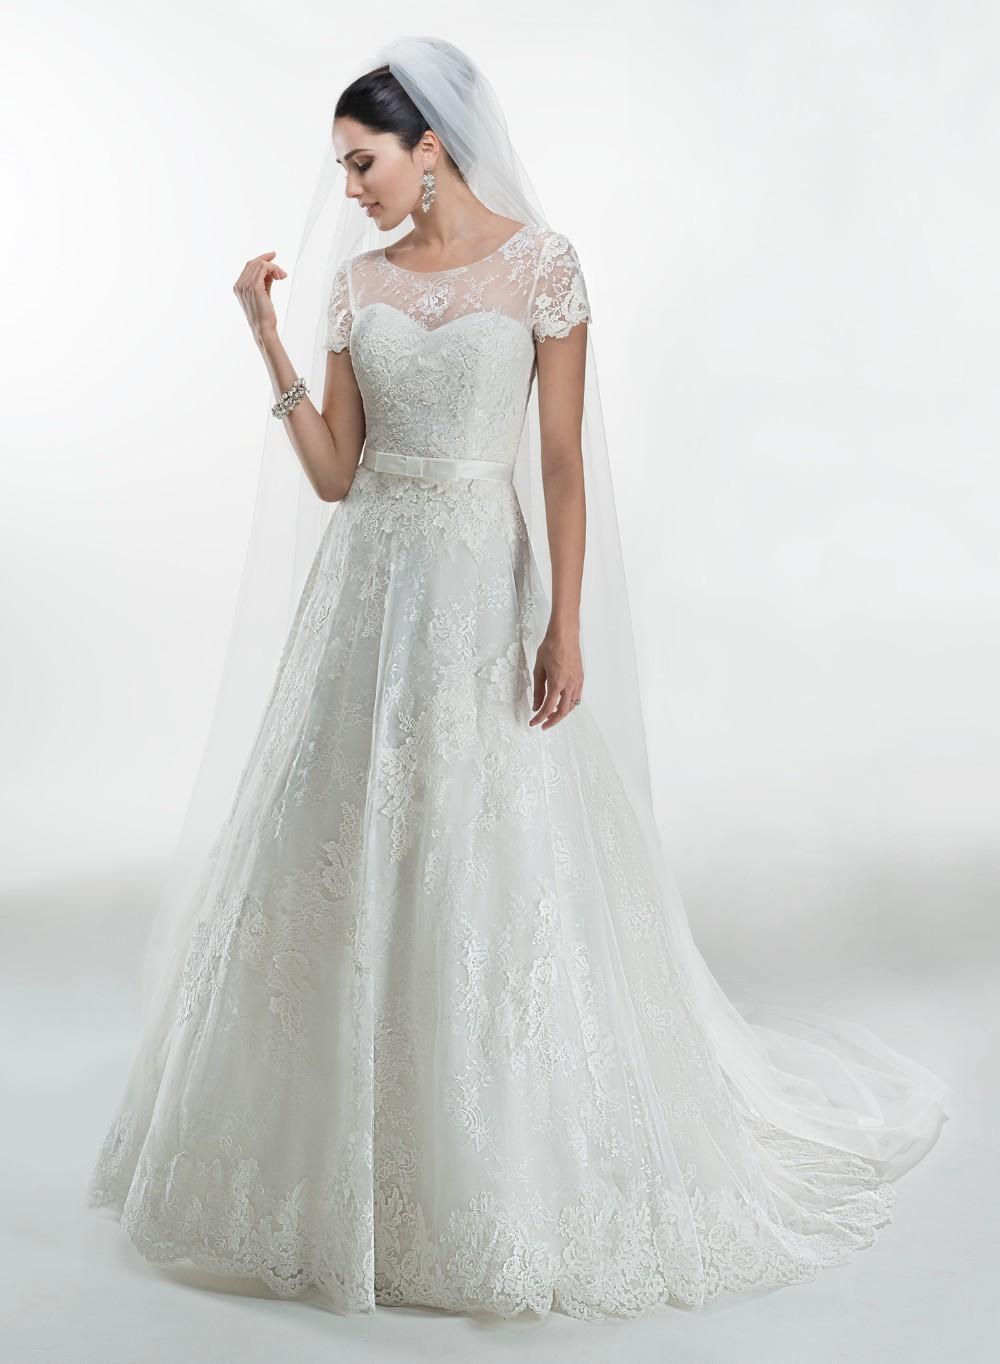 New design brides gowns western style high end a line for High end designer wedding dresses